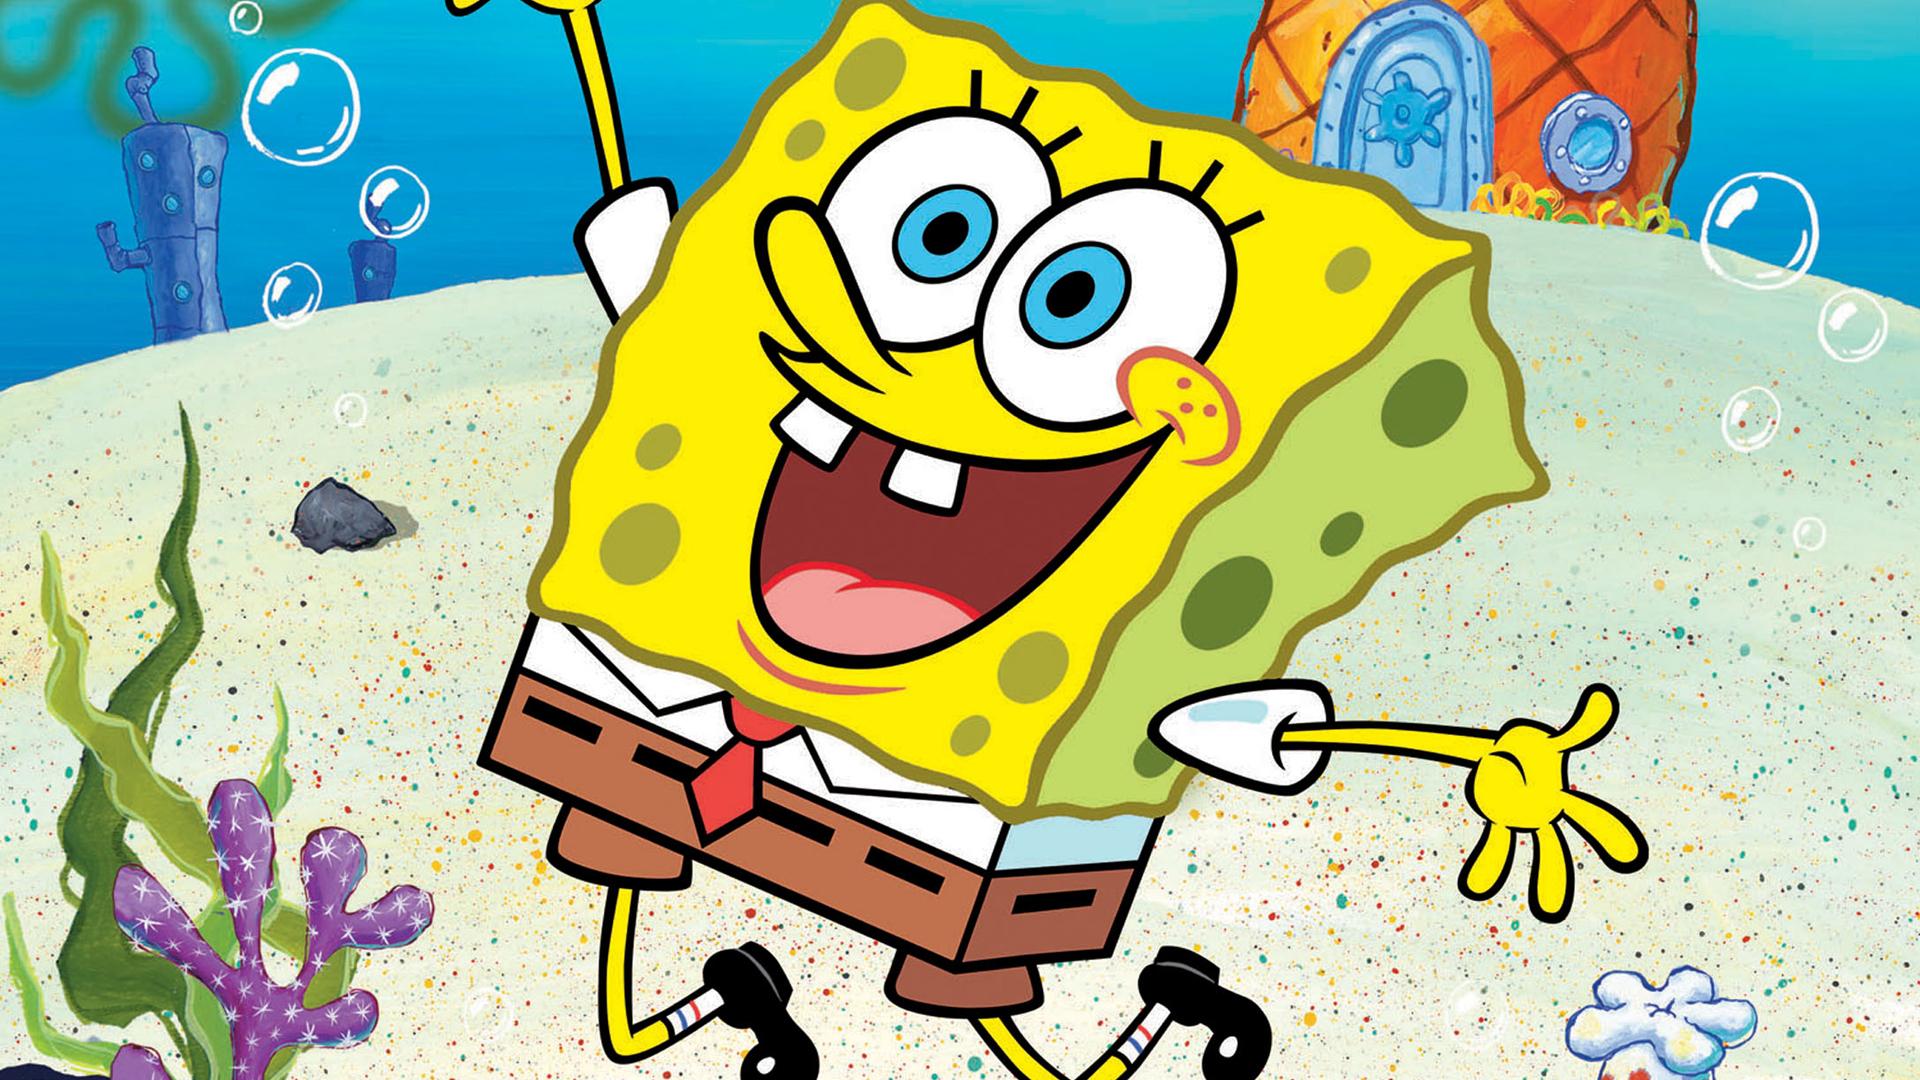 Spongebob Images